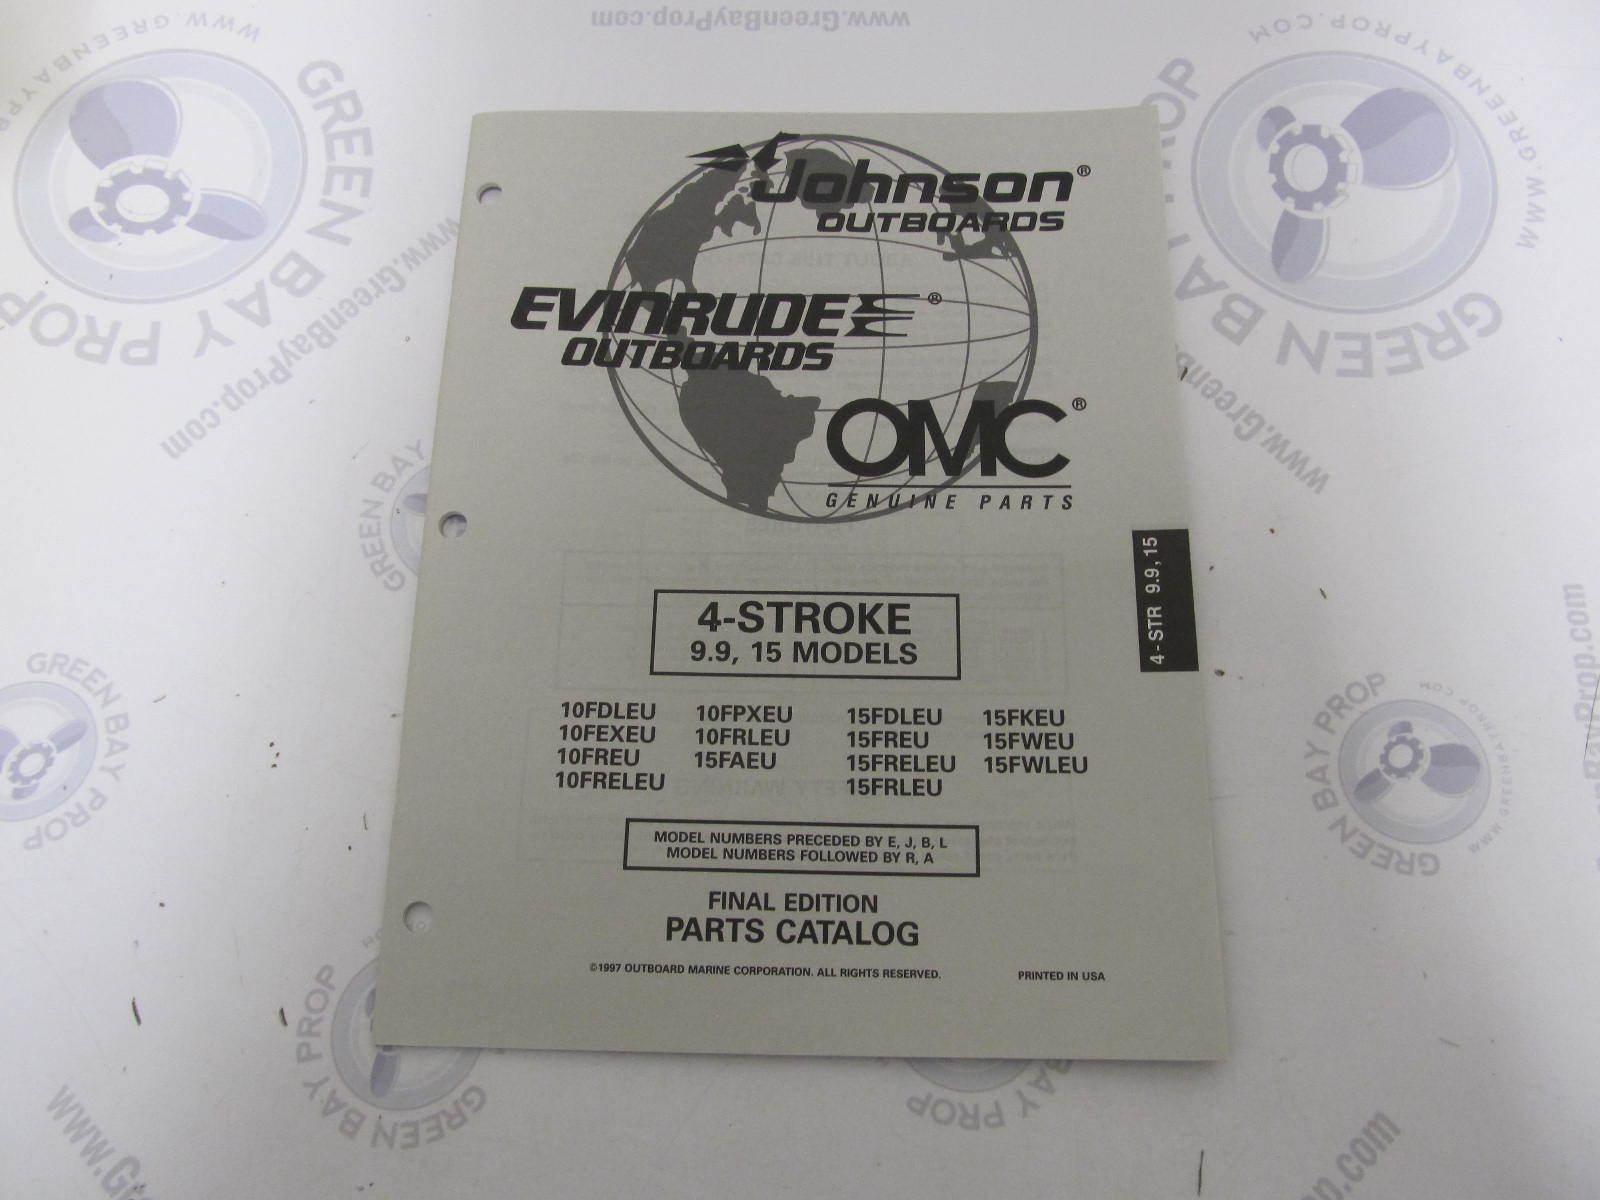 438696 OMC Evinrude Johnson 9.9-15 HP 4-Stroke Outboard Parts Catalog 1997  ...